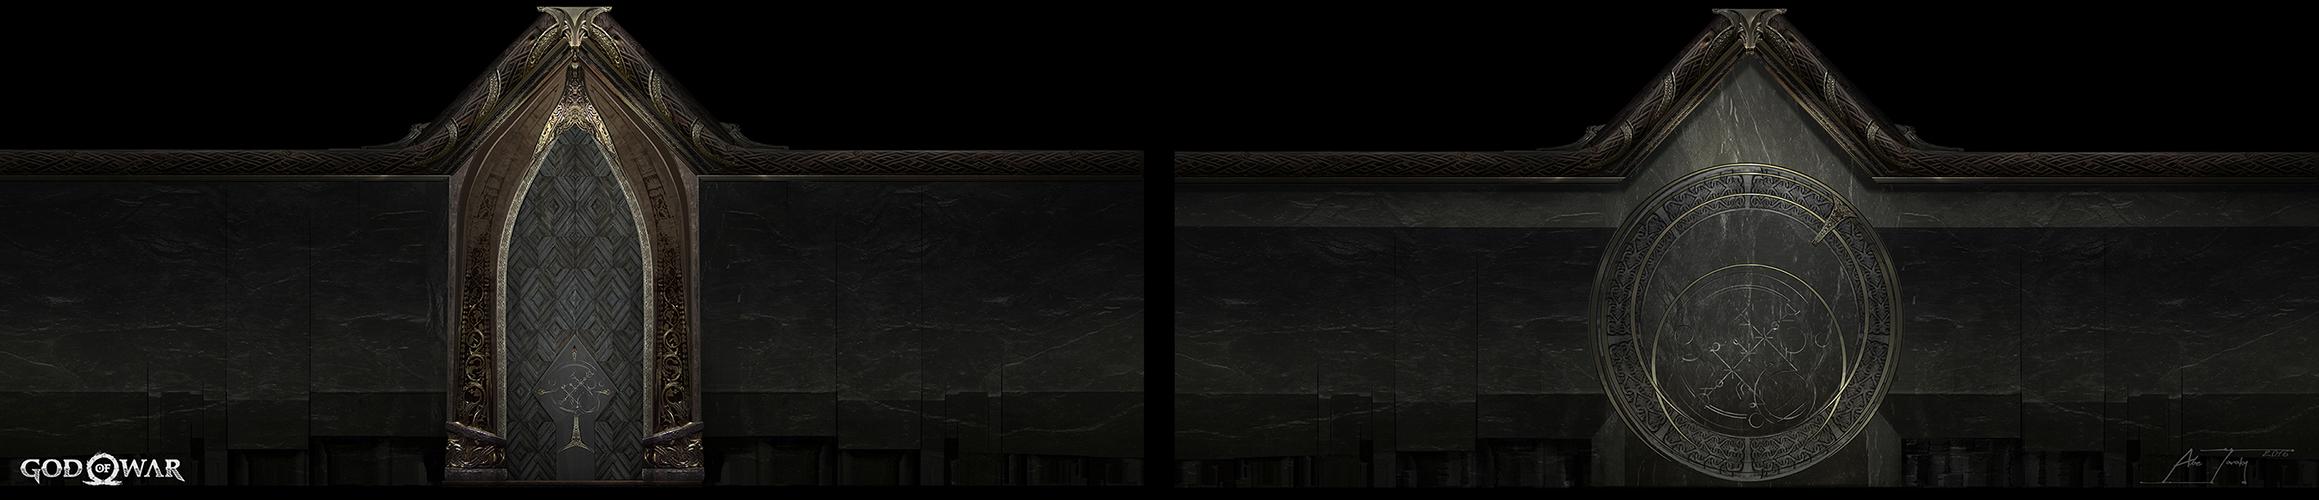 Helheim_Realm_Door_AT_04.jpg